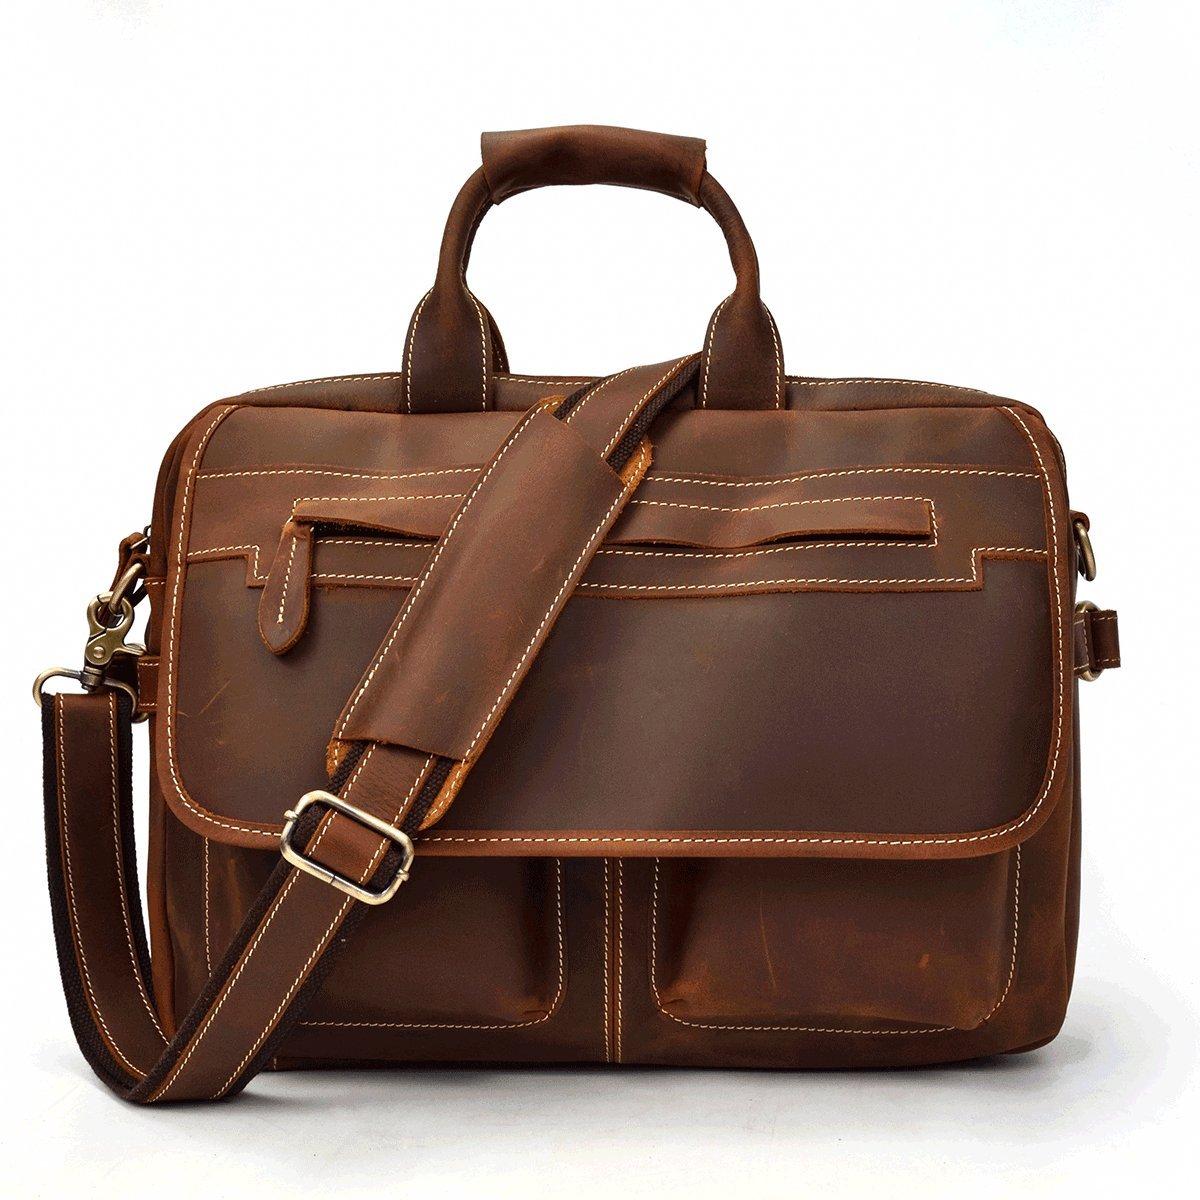 Business Work Bag, Men's Genuine Leather Laptop Briefcase Brown High-Capacity A4 Top Grain Cowhide Leather Shoulder Messenger Bag (Light Brown)